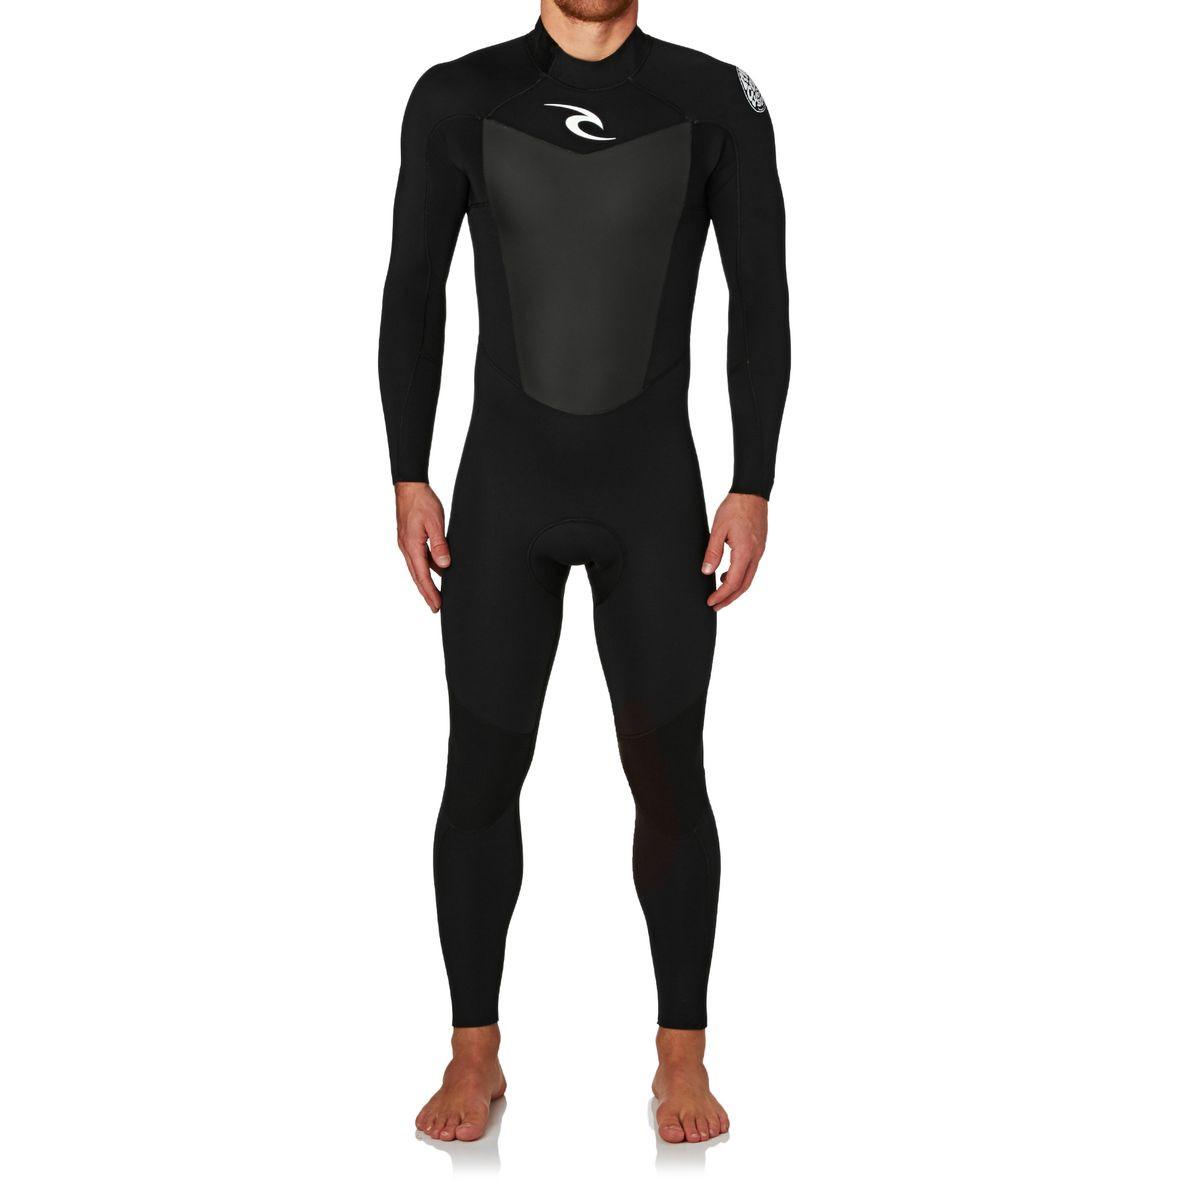 Rip Curl Omega 3/2mm 2017 Back Zip Wetsuit - Black